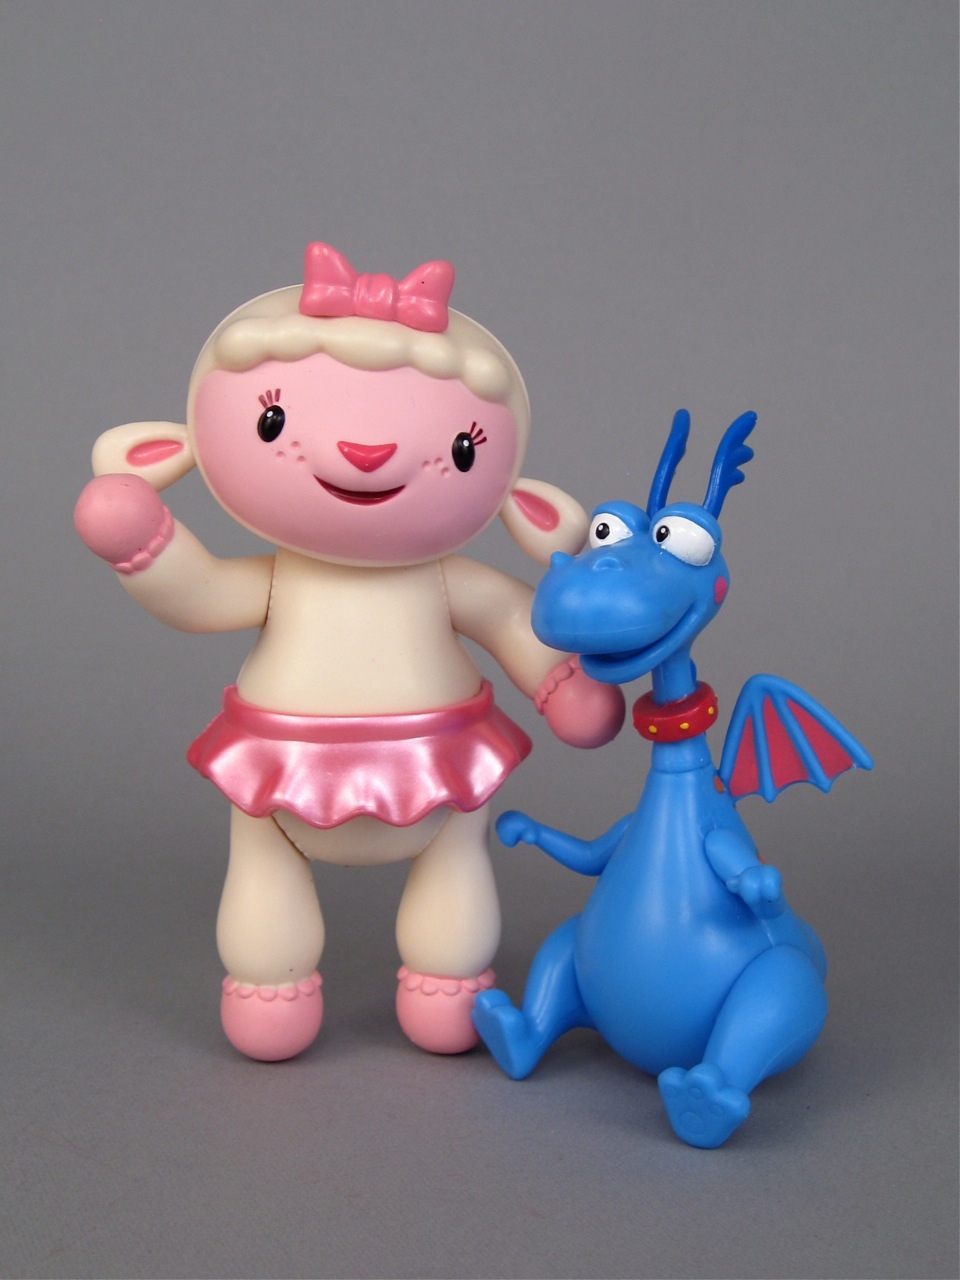 Doc McStuffins Lambie and Stuffy figures